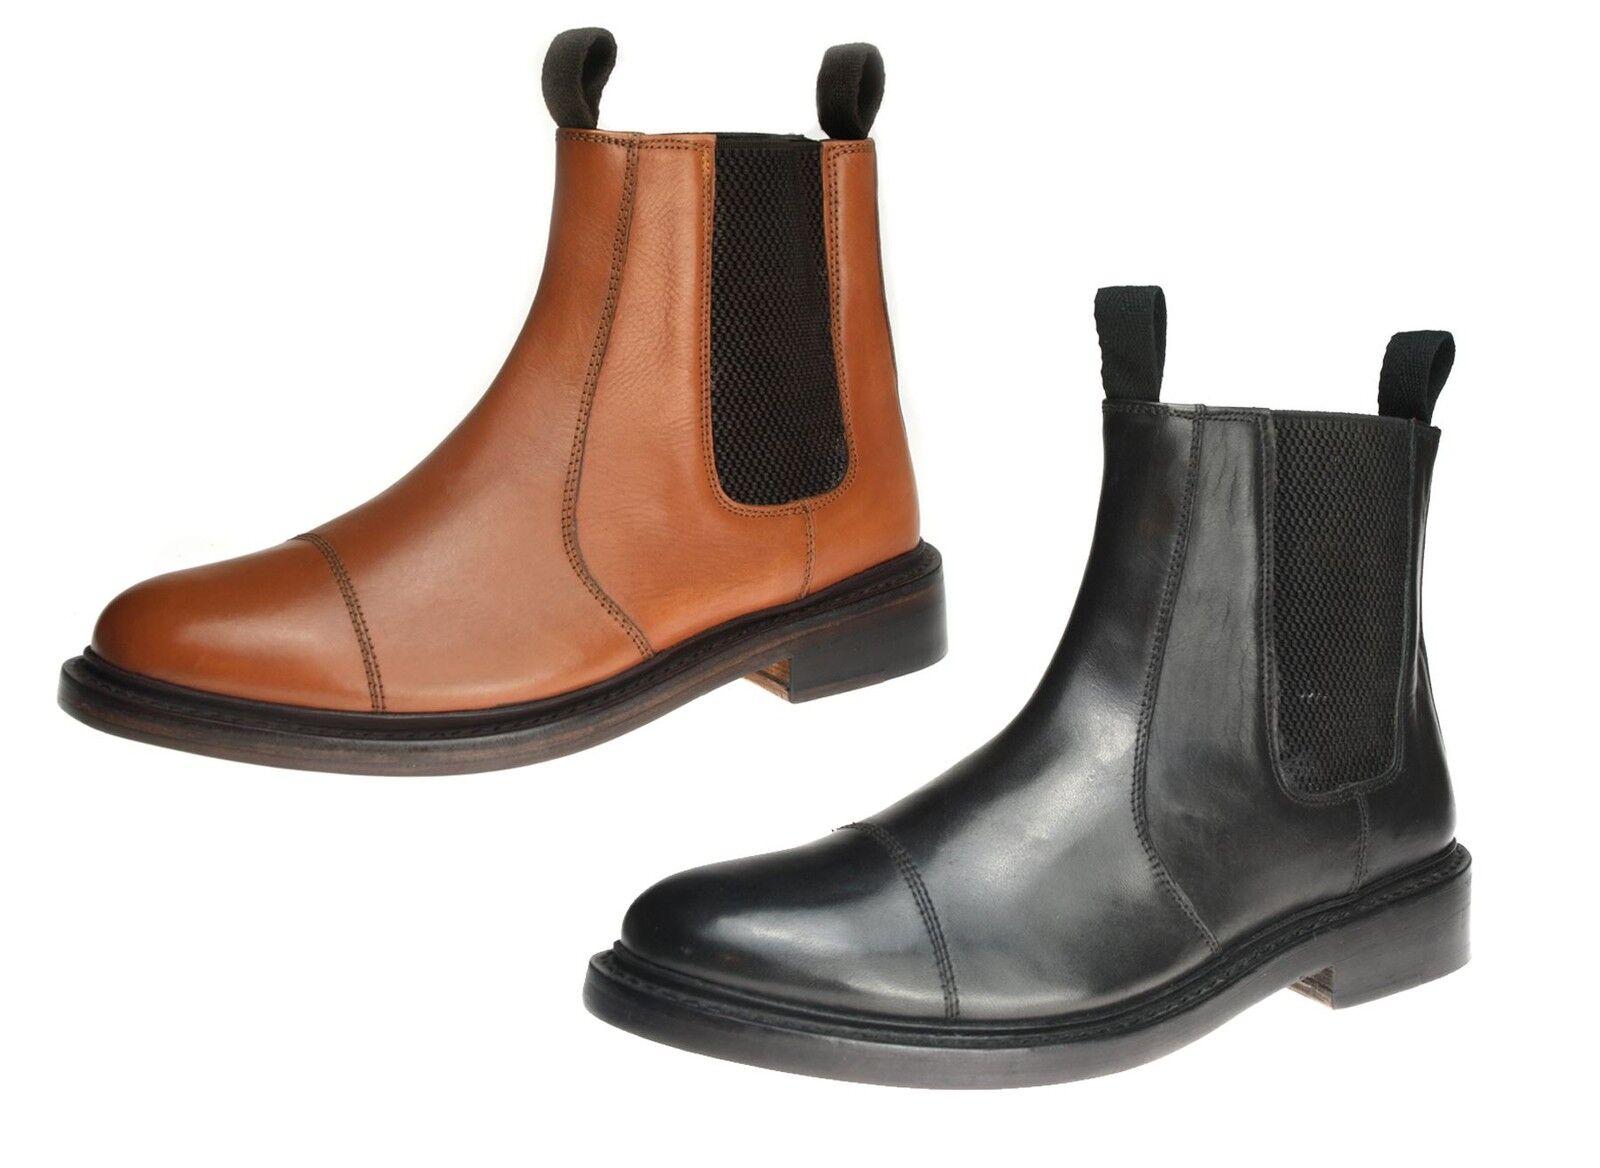 Benchgrade 1920 Para Hombre tan O Negro De Cuero Hechos A Mano ribeteadas Chelsea Distribuidor botas